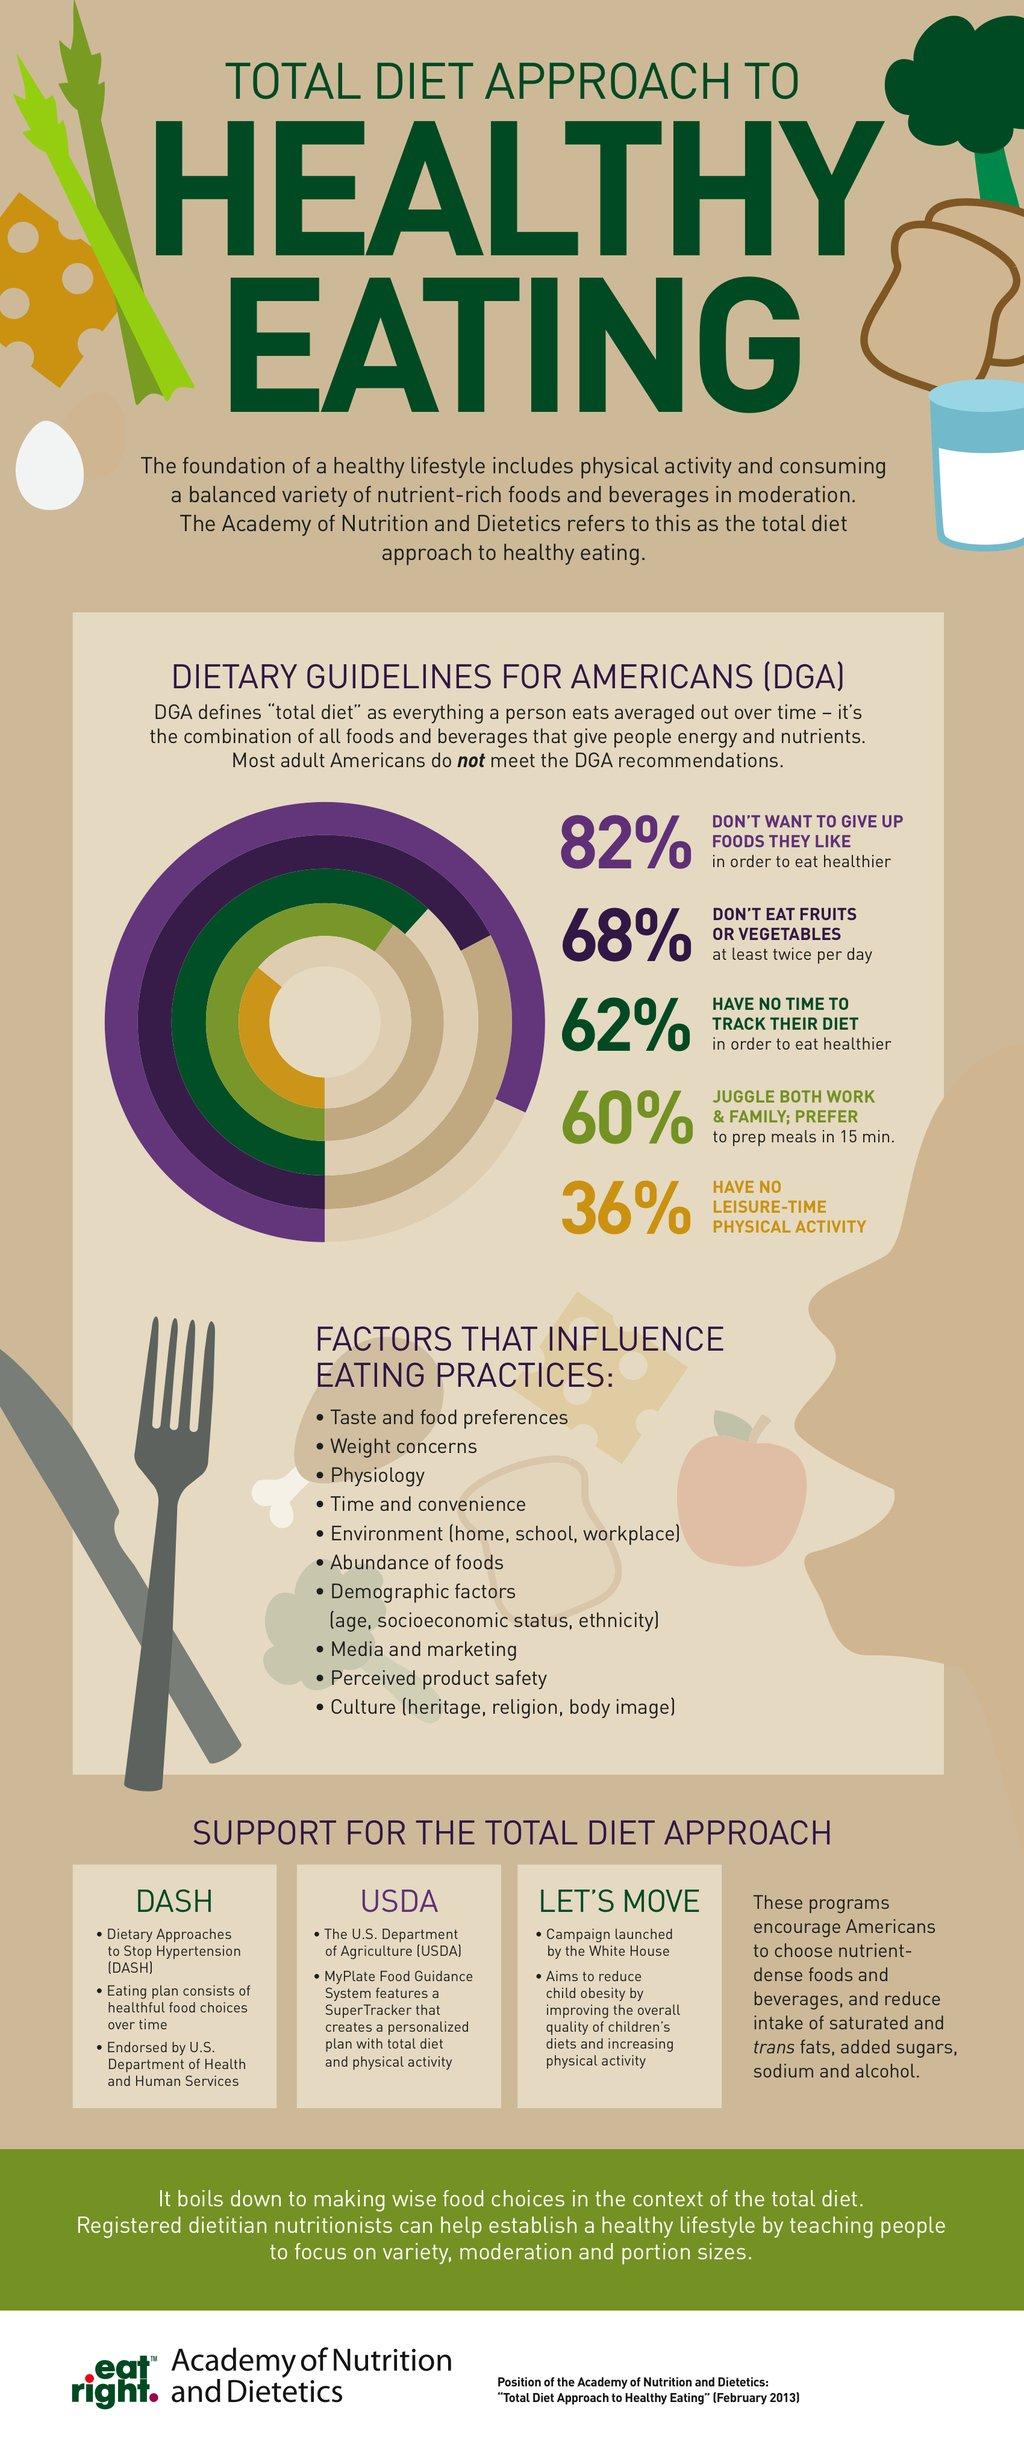 healthyeatinginfographic-pic.jpg